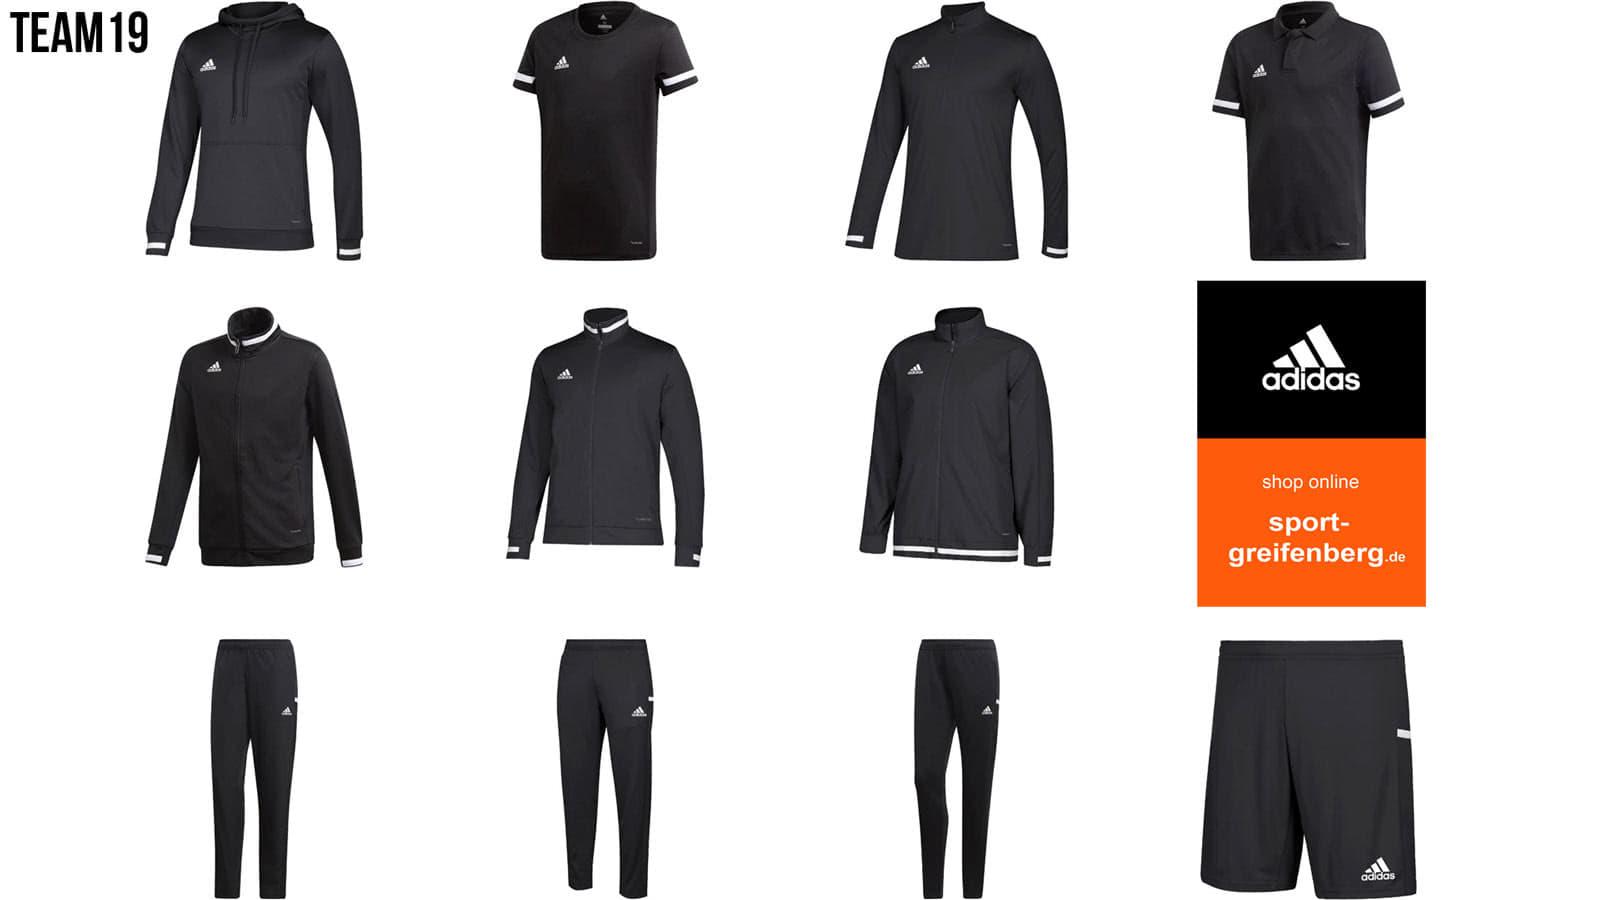 adidas Training   Sportbekleidung   Teamsport Serien günstig